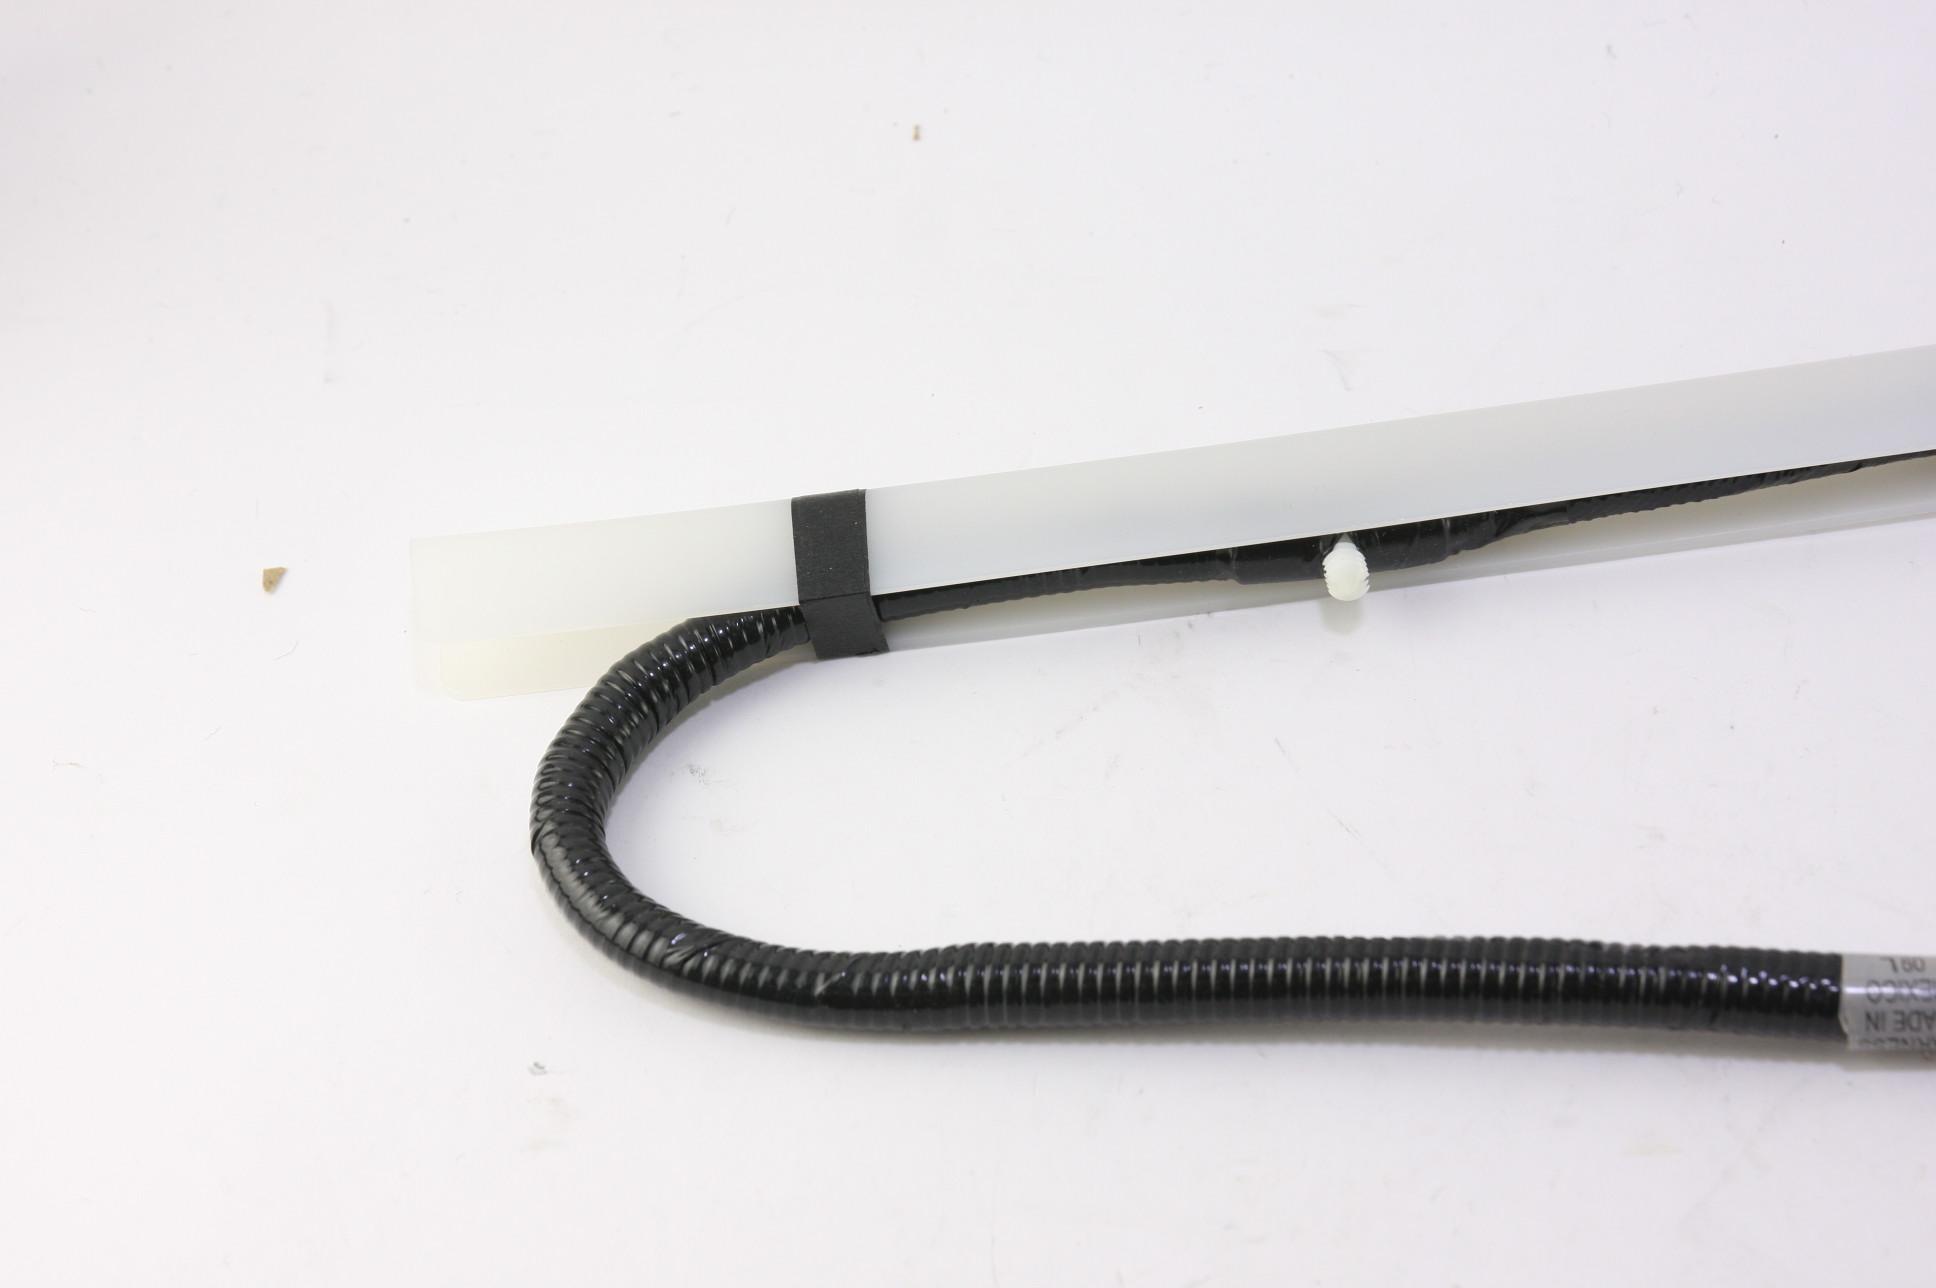 New Oem 8c3z14a411b Ford Wire Harness Assembly Jumper To Rear Camera Nip Tools